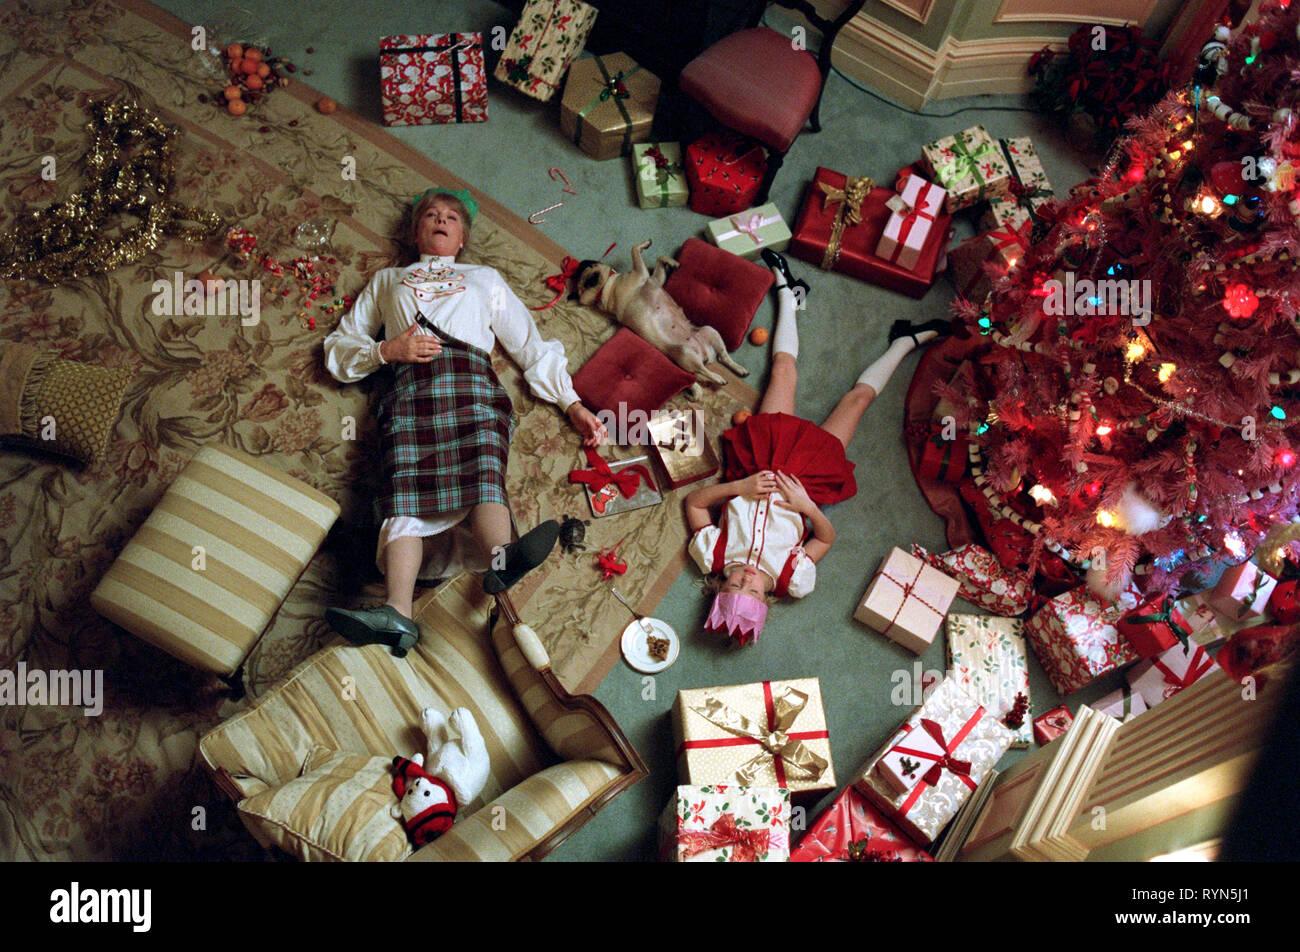 Eloise At Christmastime.Andrews Vassilieva Eloise At Christmastime 2003 Stock